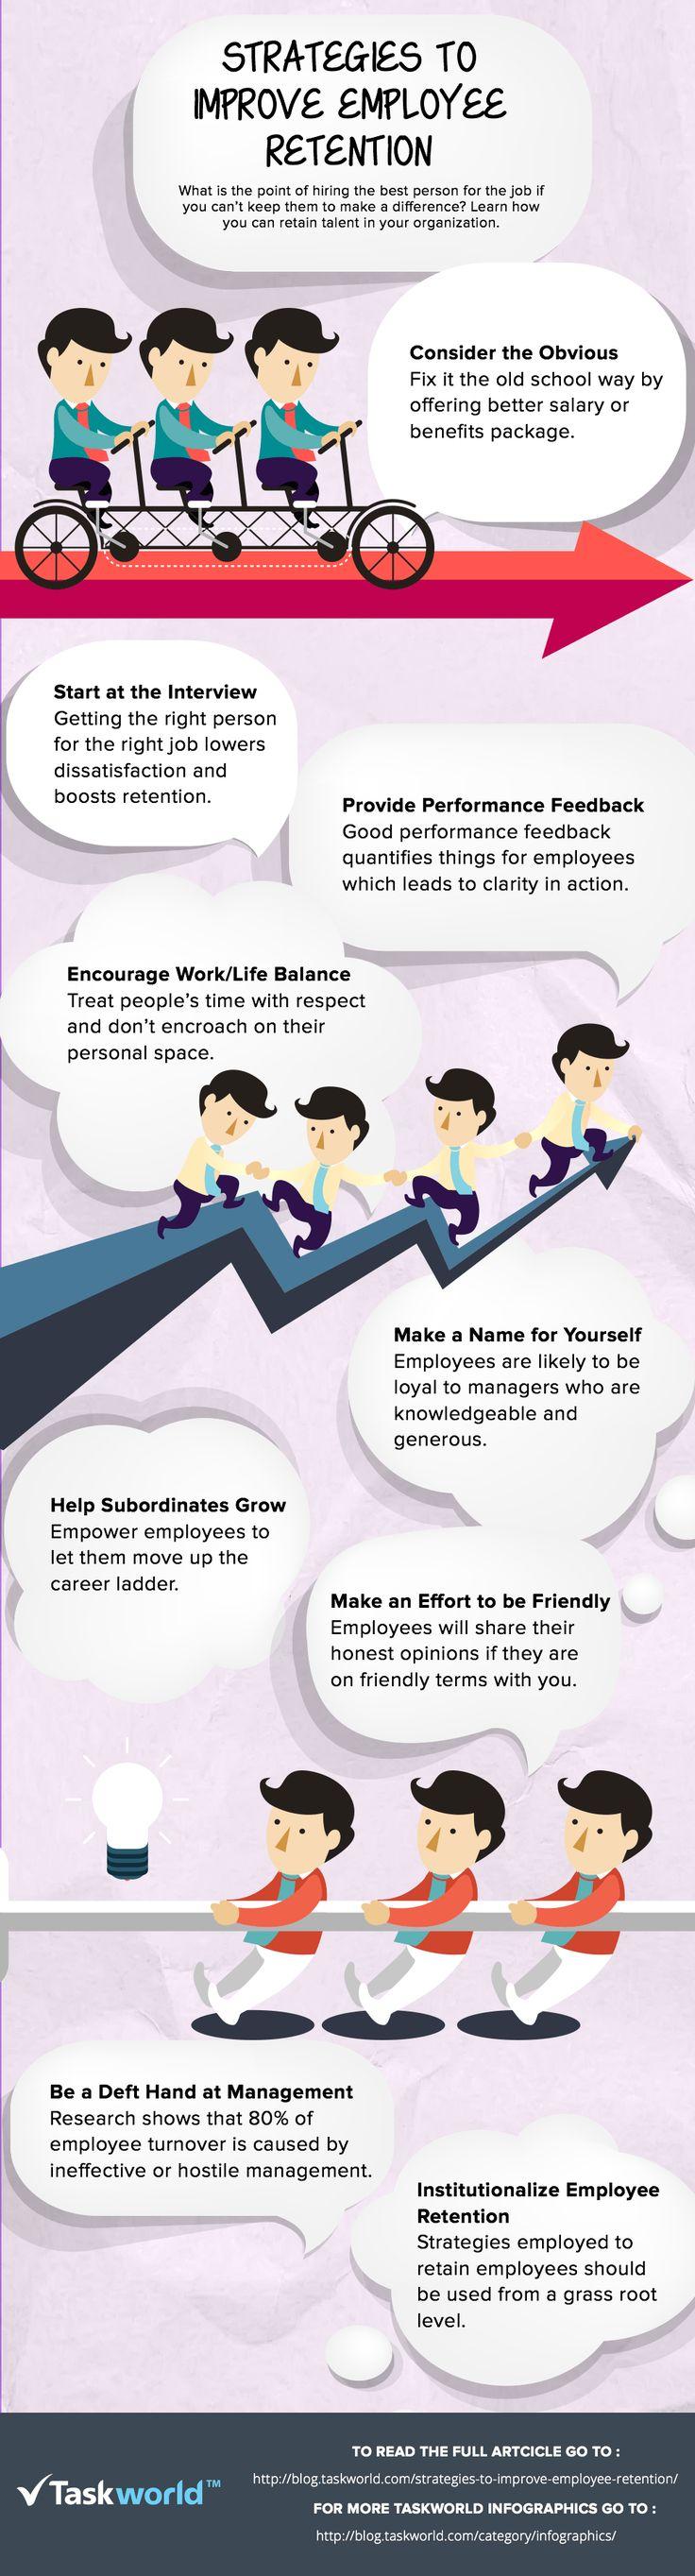 Motivation Drives Better Performance